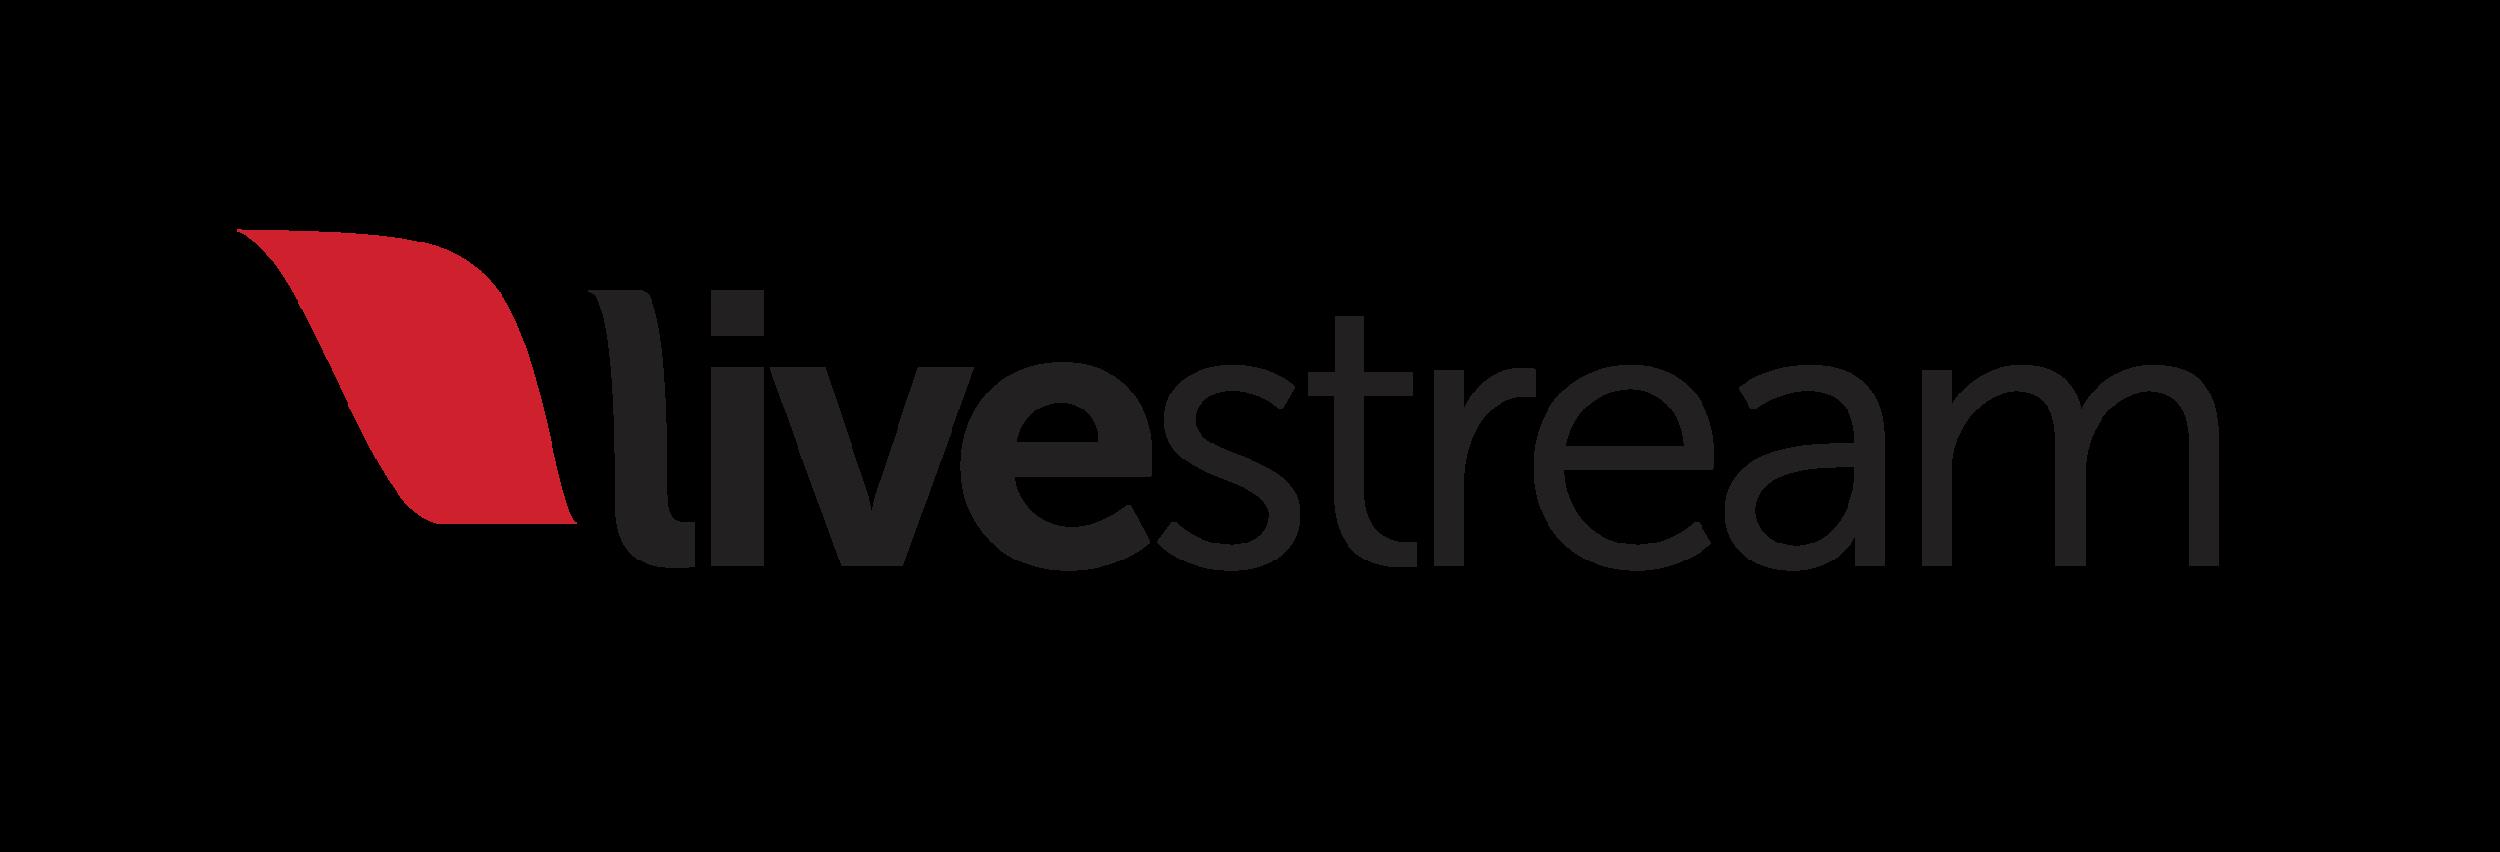 Livestream_logo-rgb_standard.png